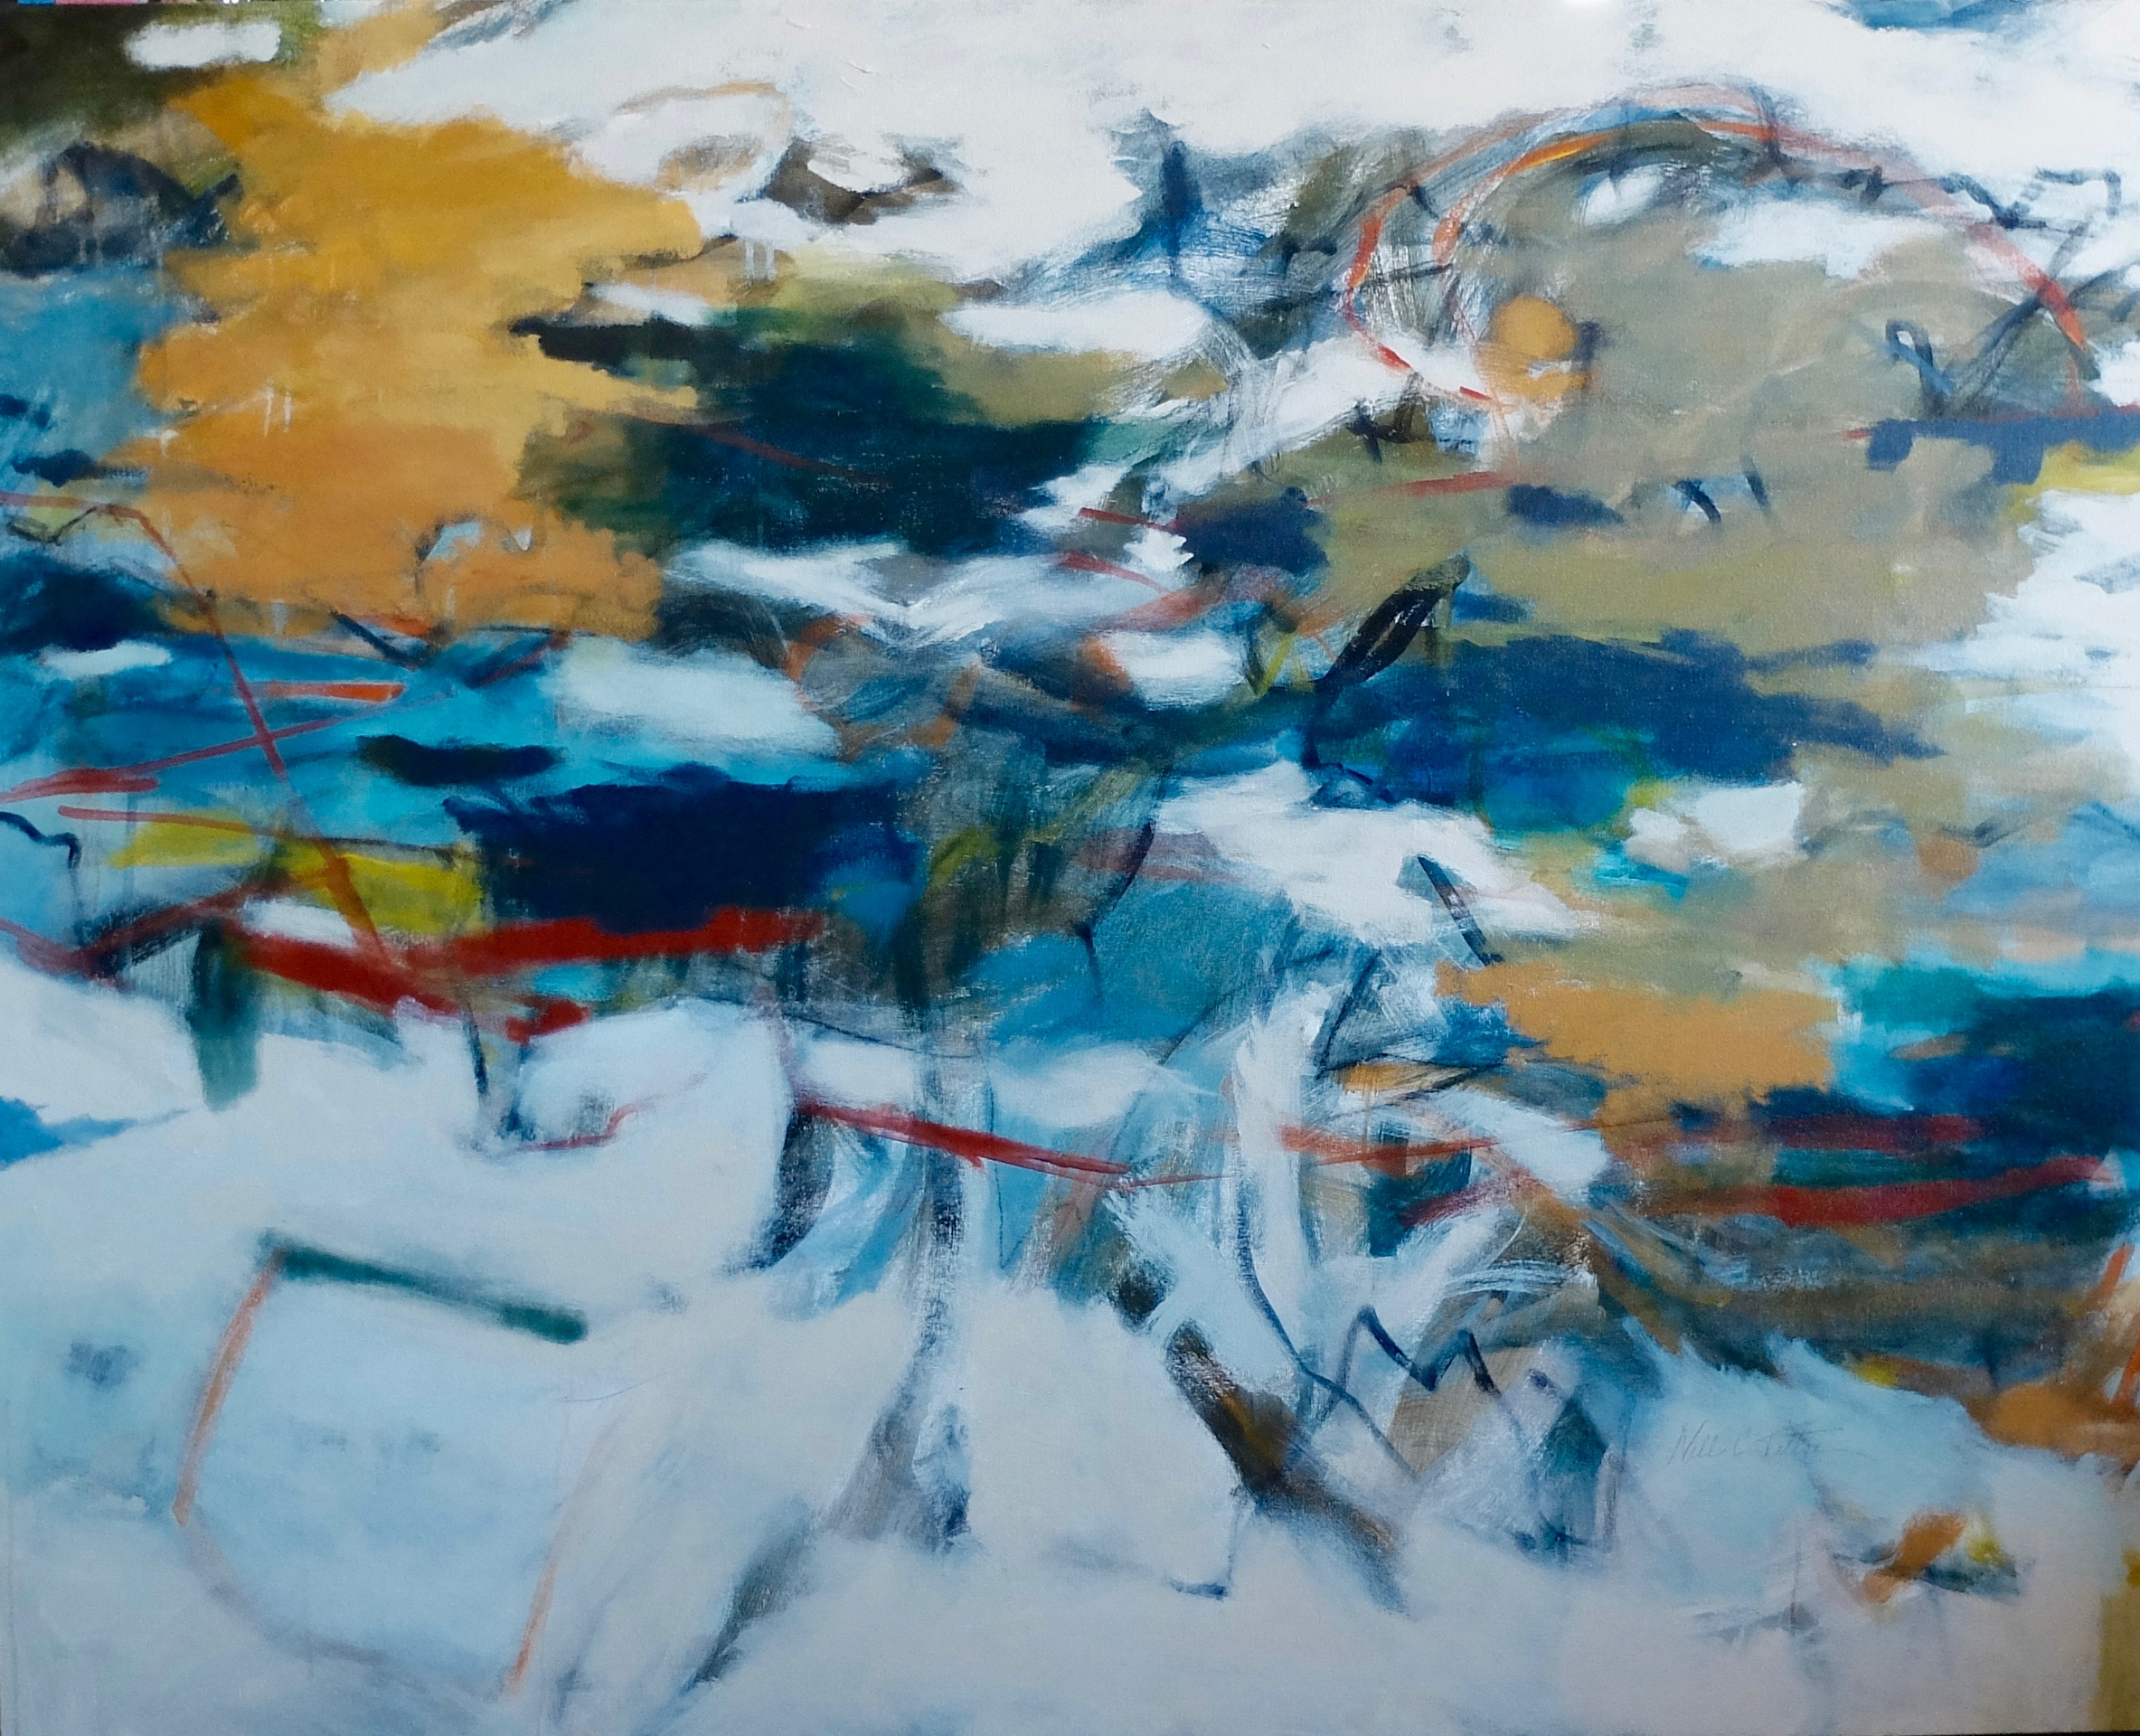 "SPIRITUAL 48"" x 60"" Acrylic/Mixed Media on Canvas"